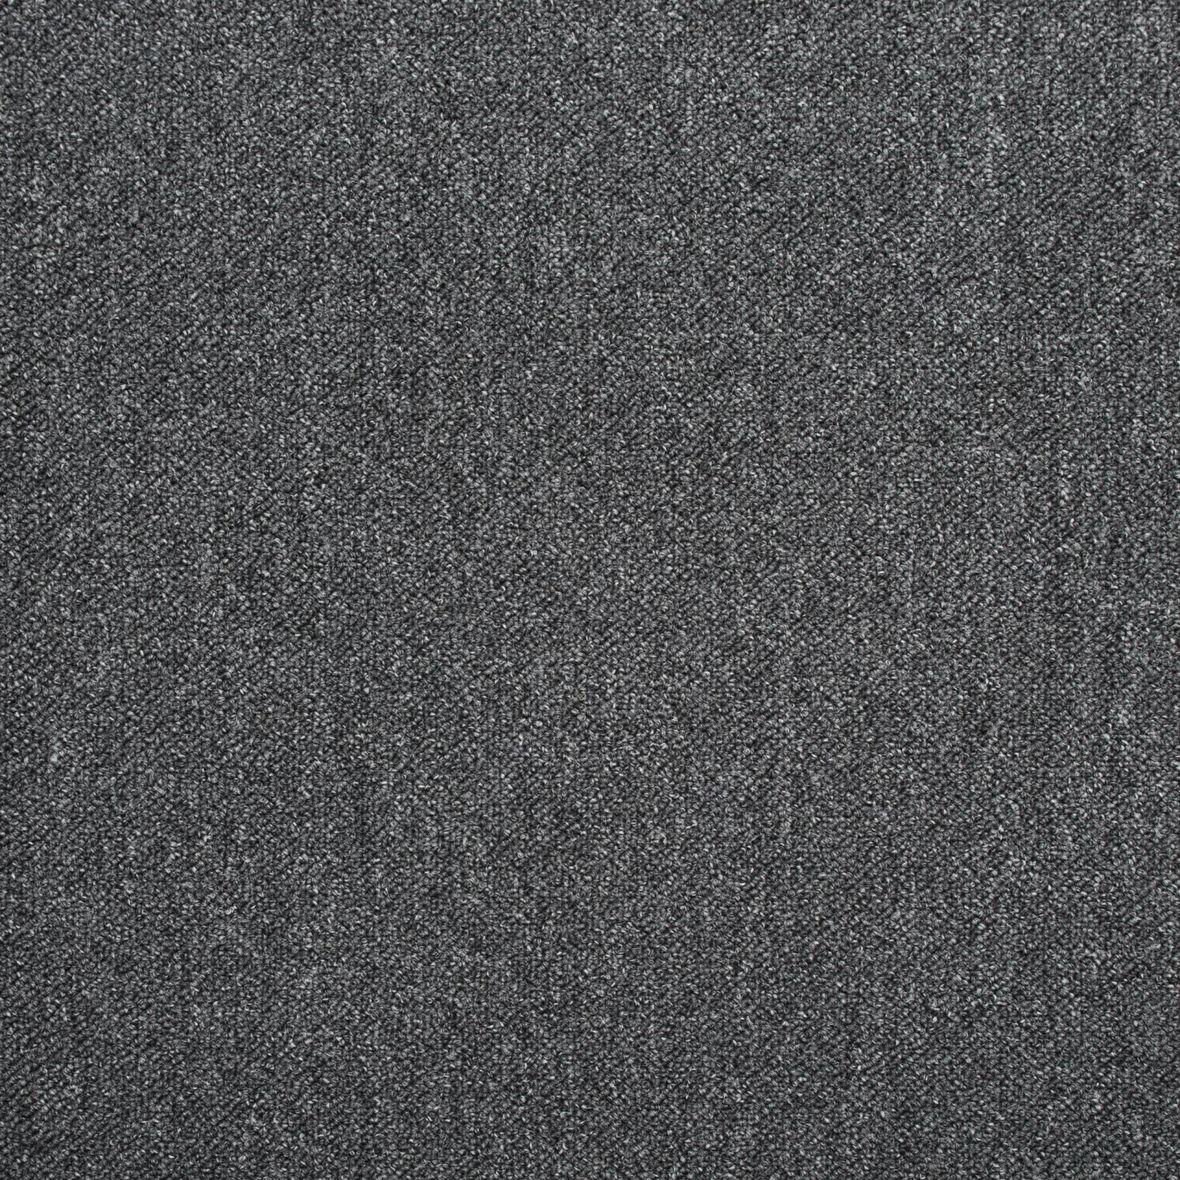 PŁYTKI CREATIVE SPARK 50X50 979